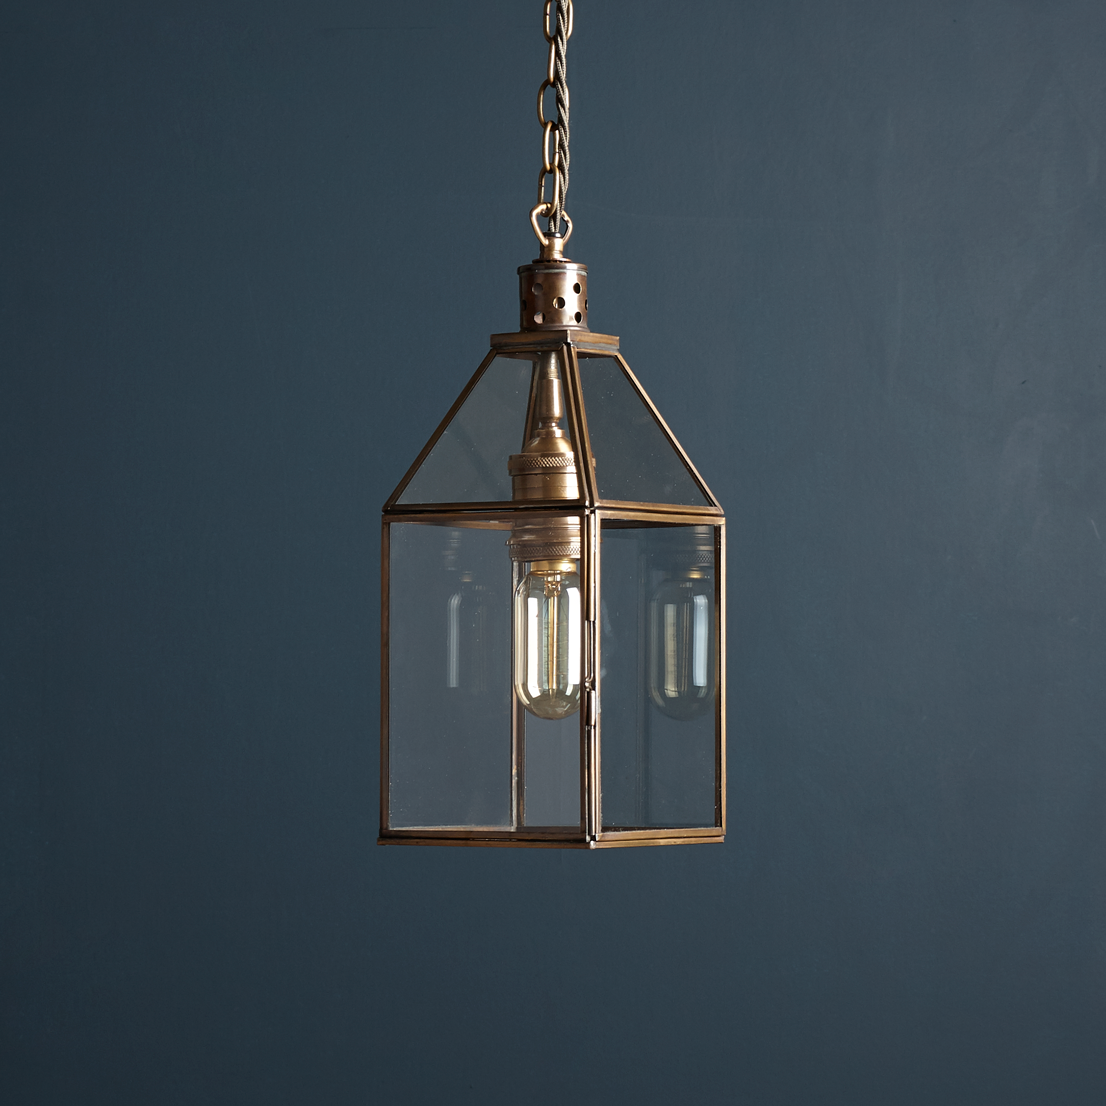 Very simple glass lantern pendant with antique brass framework ... - Lantern pendant